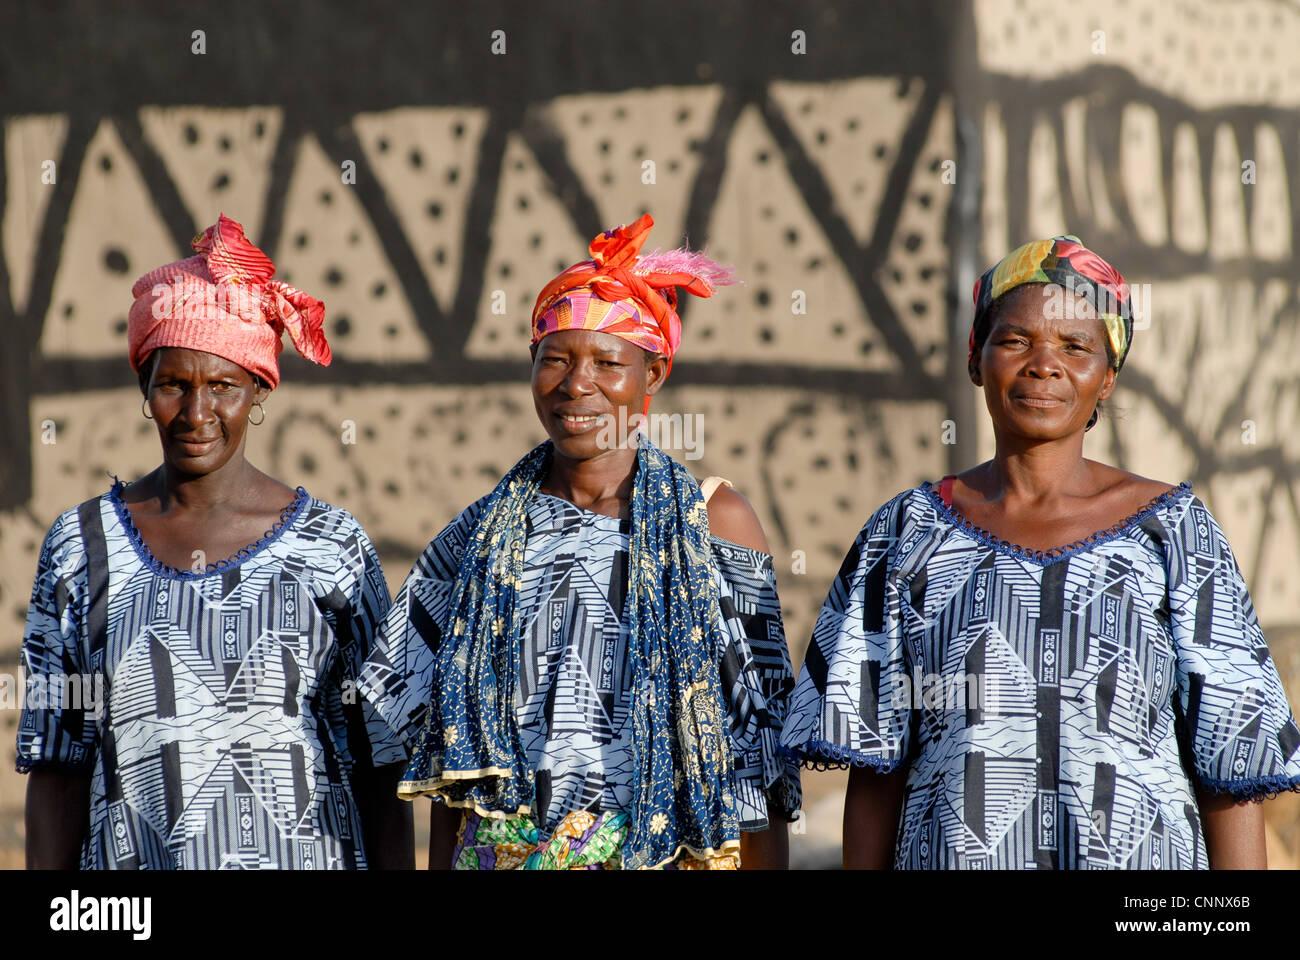 Burkina Faso , village Sesuala near Pó, ethnic Kassena, women group produce fair trade shea butter from Shea nuts Stock Photo